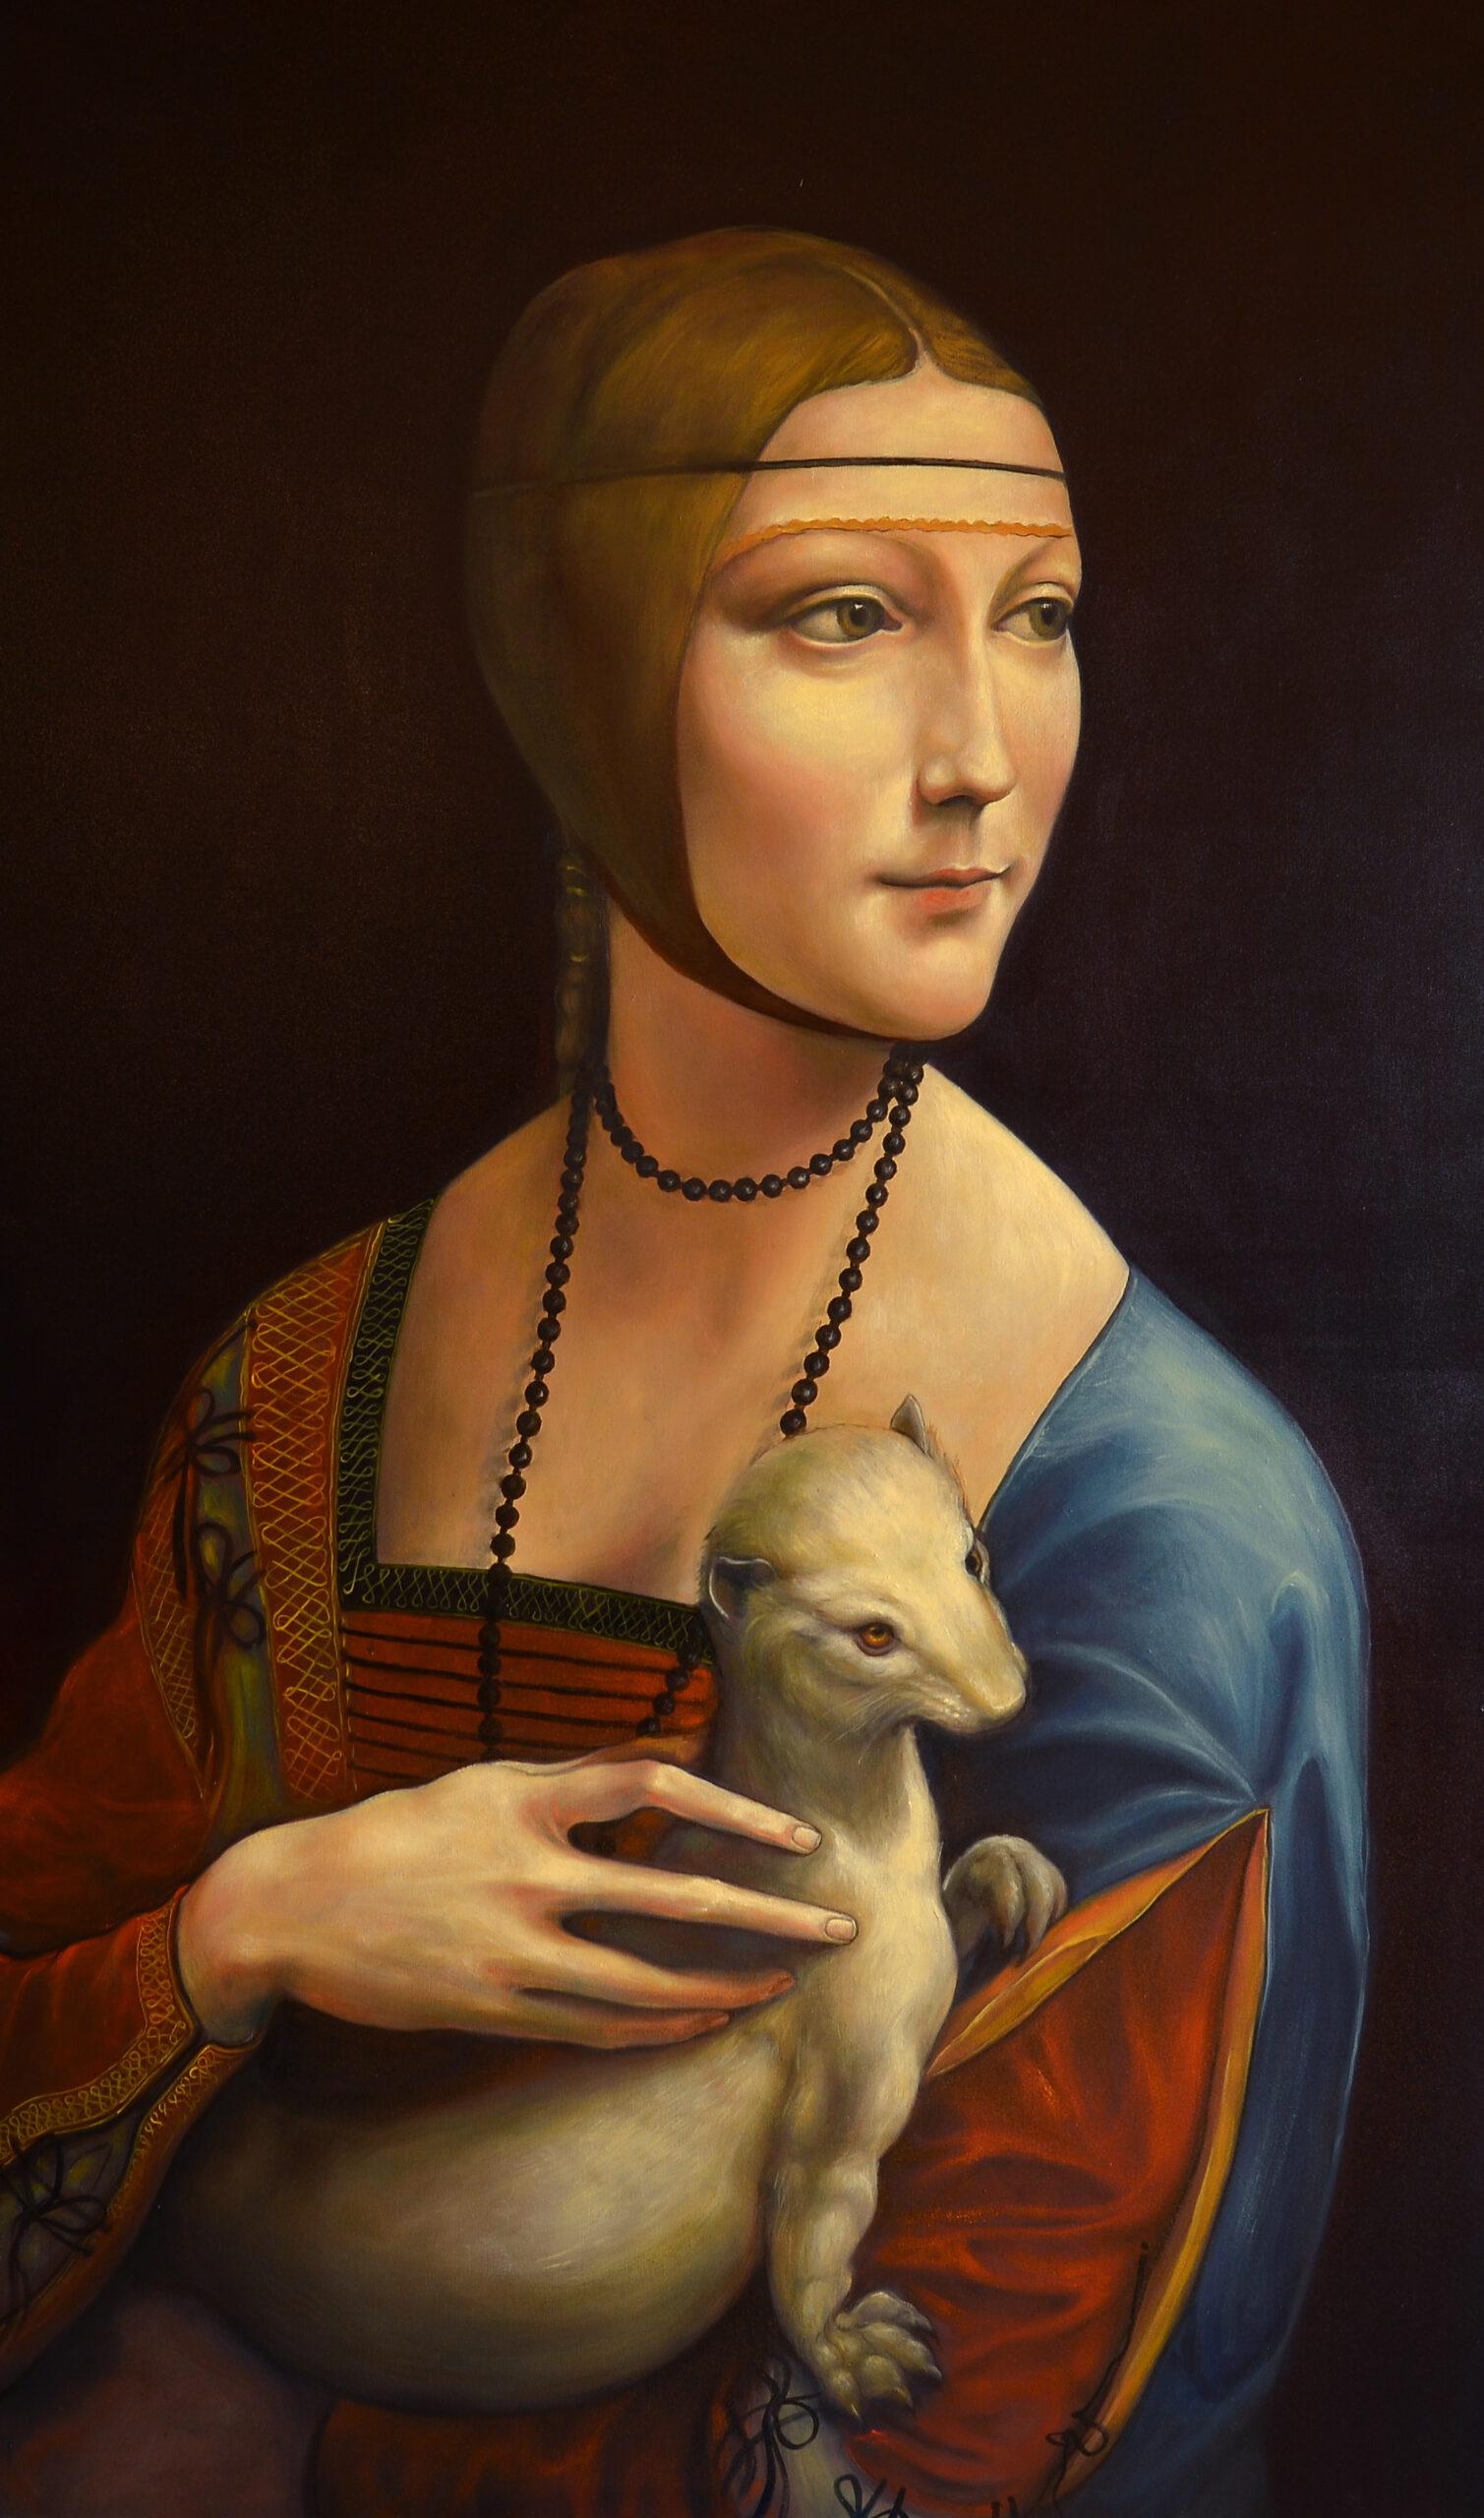 Jibran Shahid<br></br>'After Leonardo'<br></br>Oil On Canvas<br></br>60x36 inches